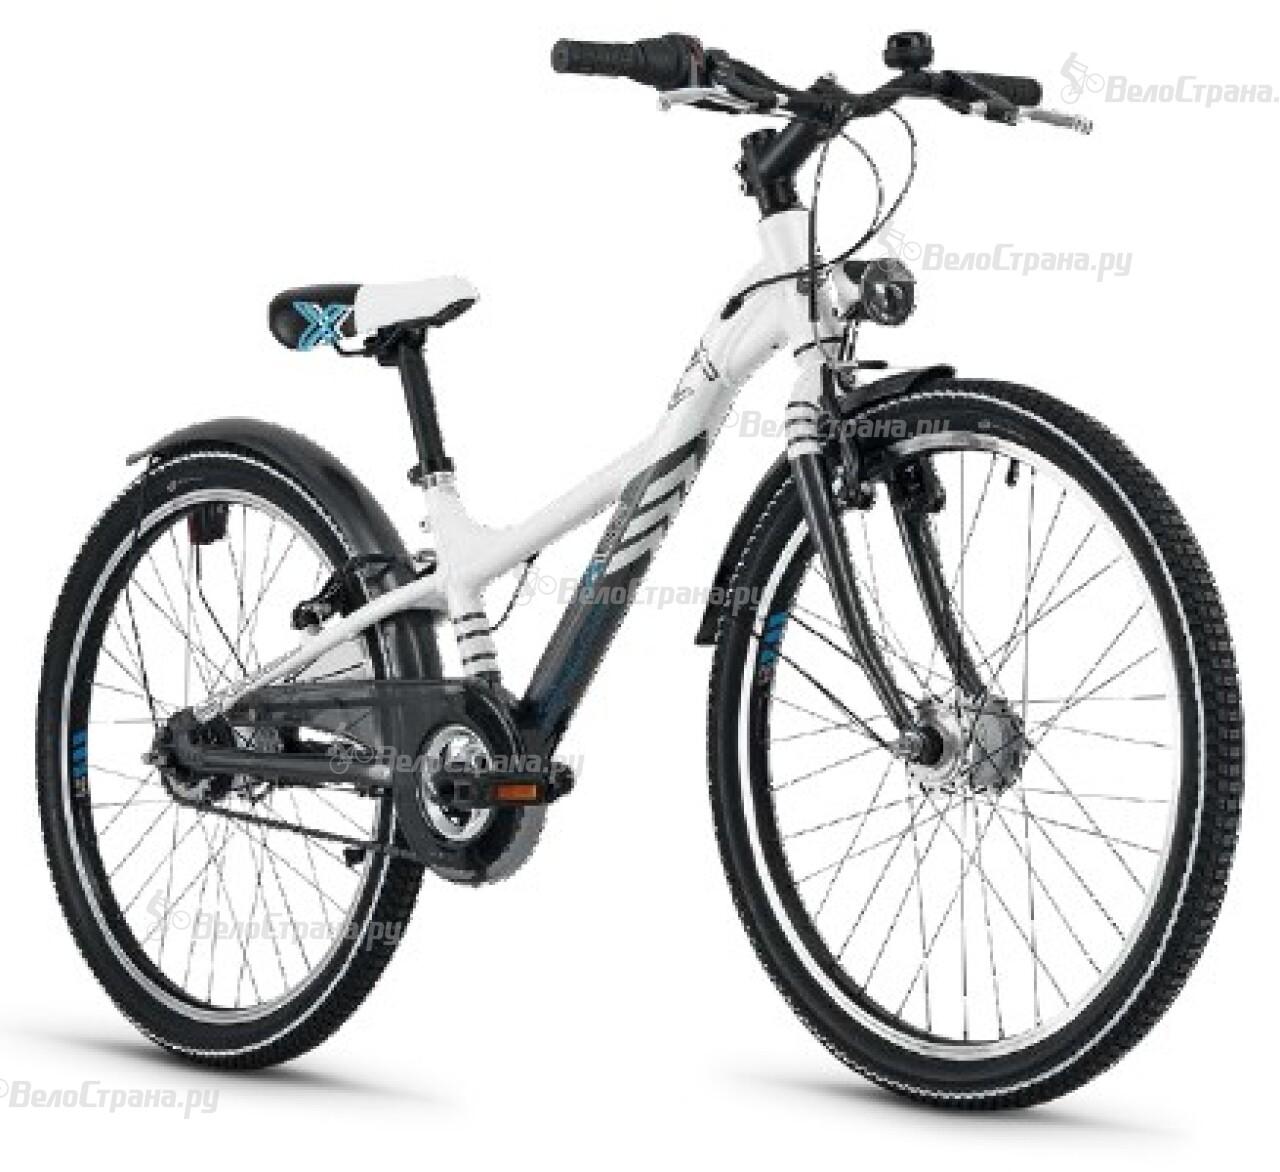 Велосипед Scool XX lite 24 3S (2014) цена